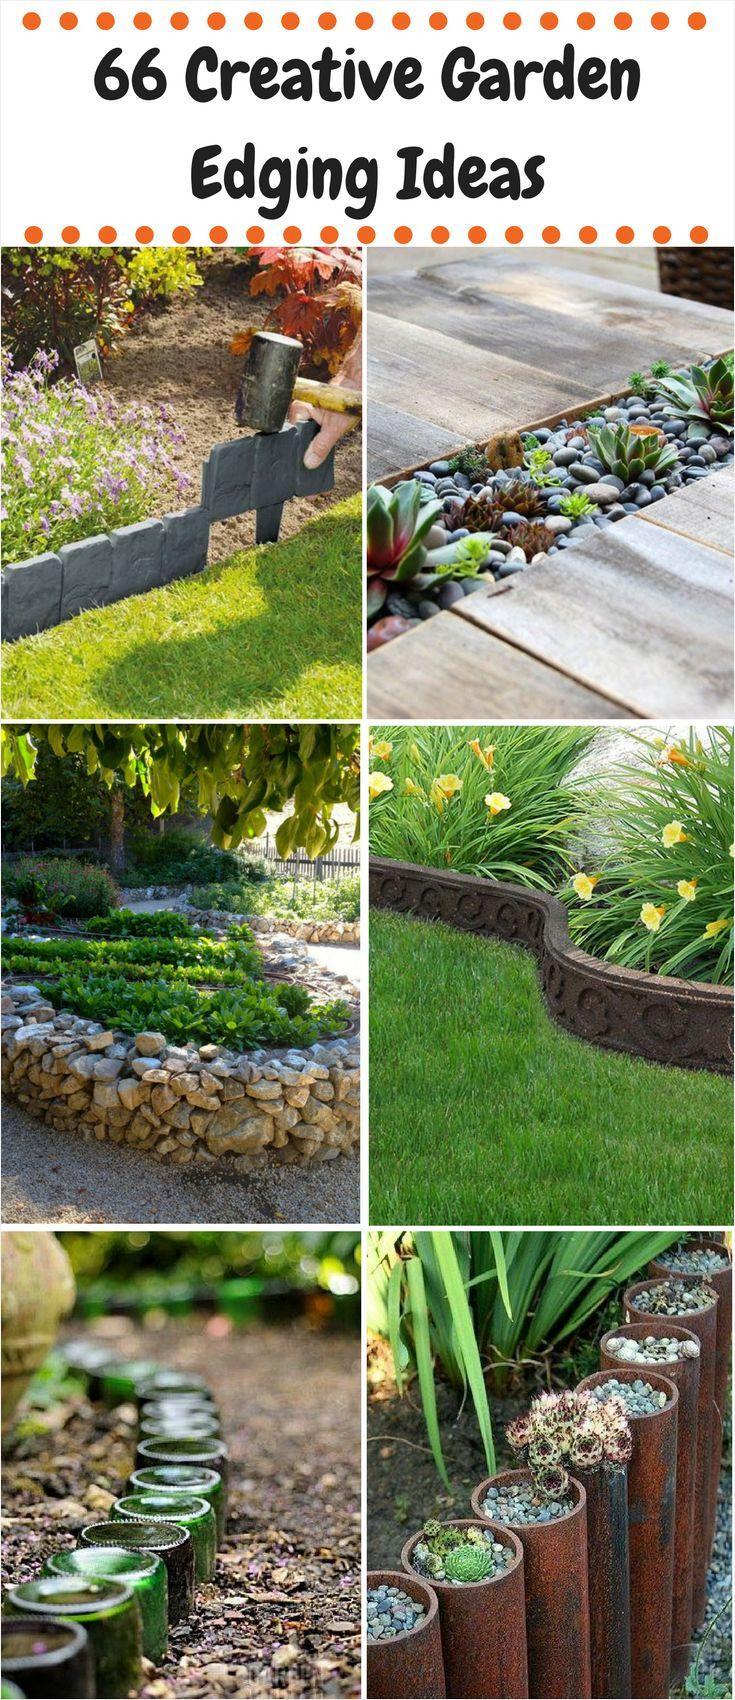 25 Best Garden Ideas On Pinterest Realistic Landscape Garden Edging Ideas Bu153917 Garden Edging Landscape Edging Creative Landscape